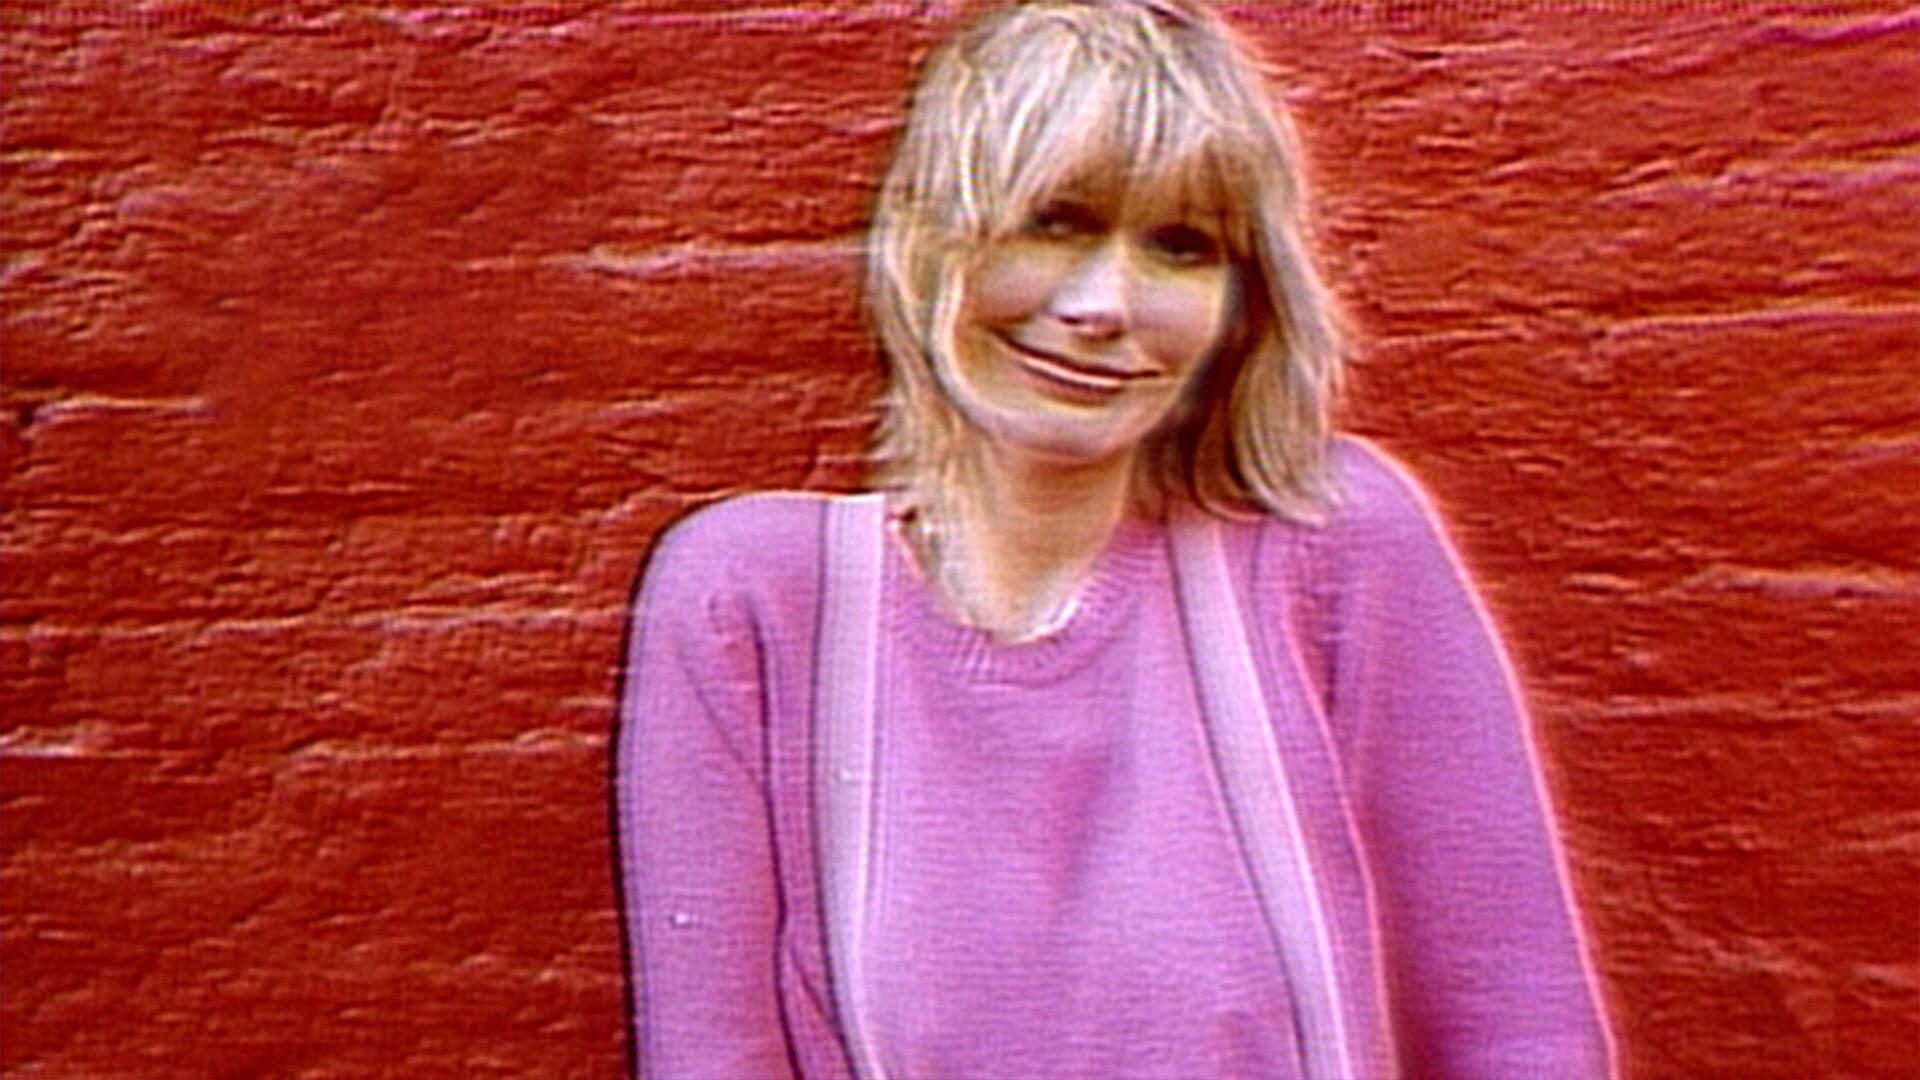 Sally Kellerman: February 7, 1981